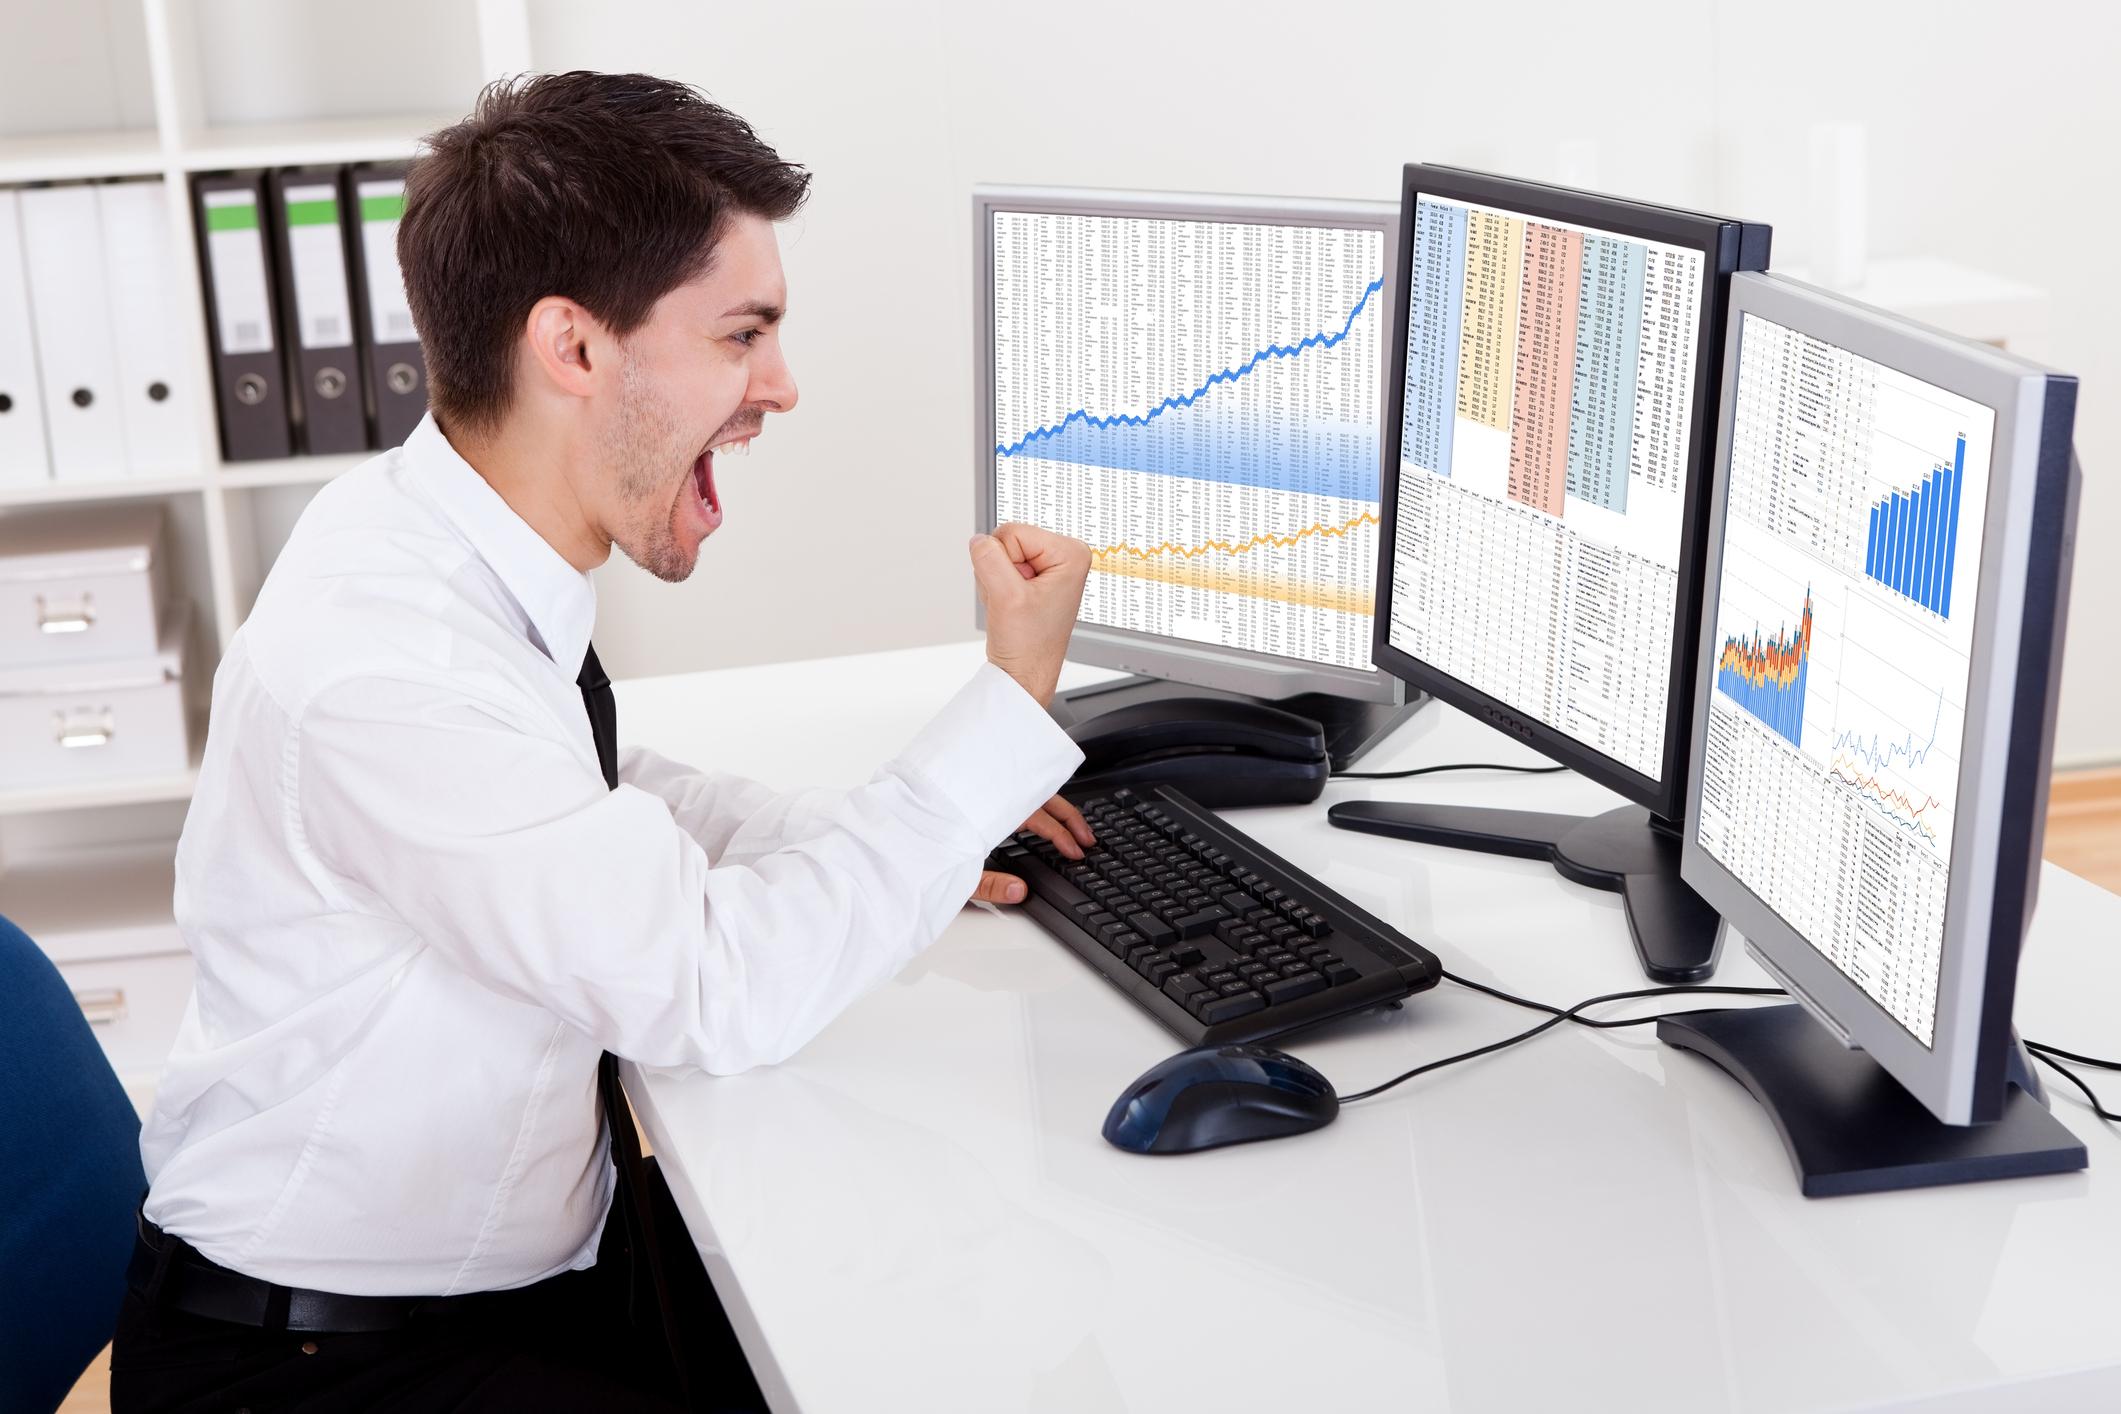 A cheering man looking at stock charts on three computer screens and pumping his right fist.